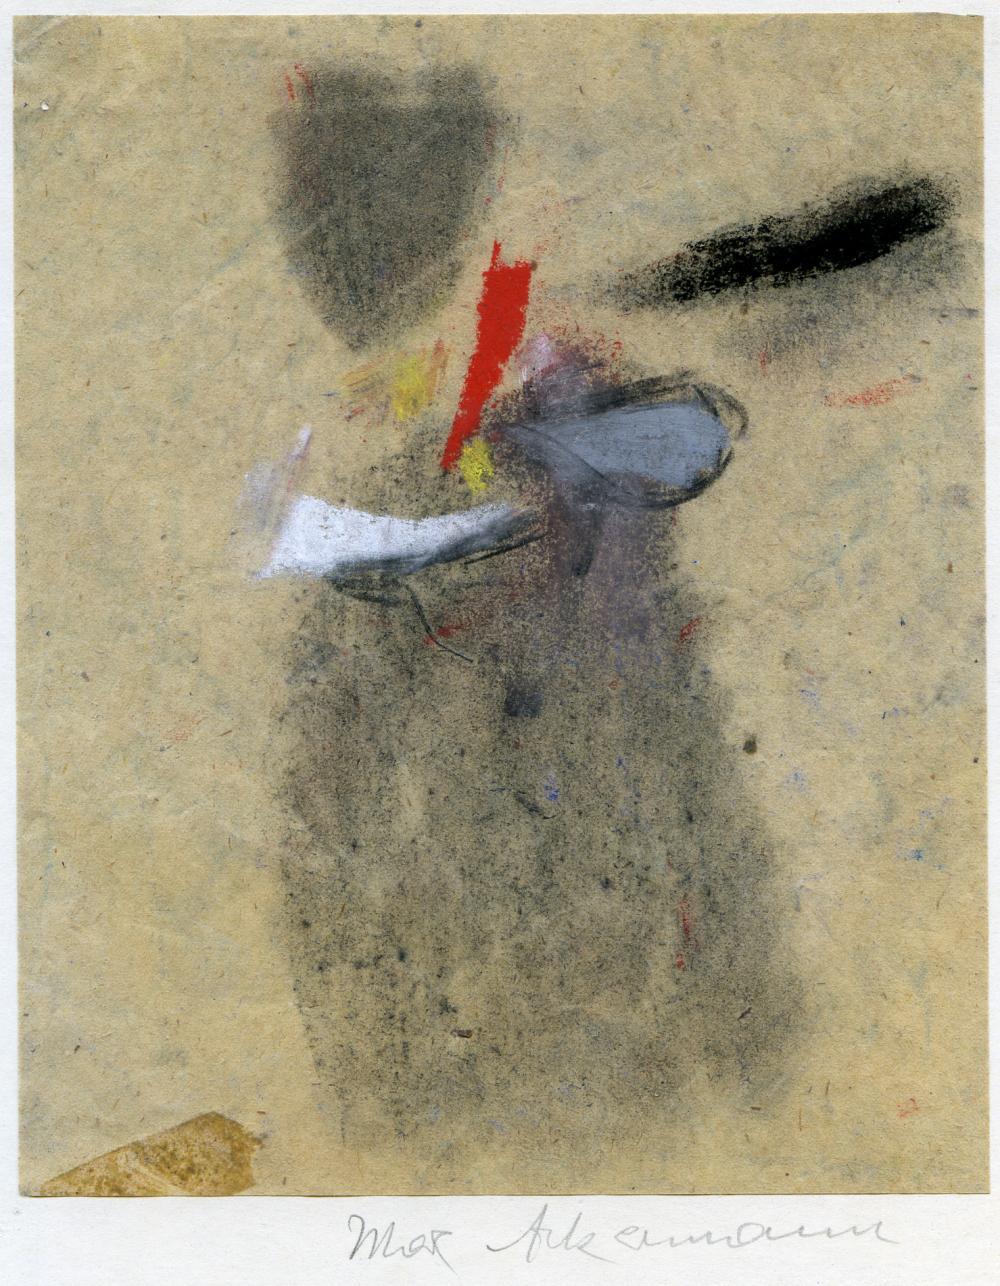 Max Ackermann (1887–1975): Rote Zentrale (1950)